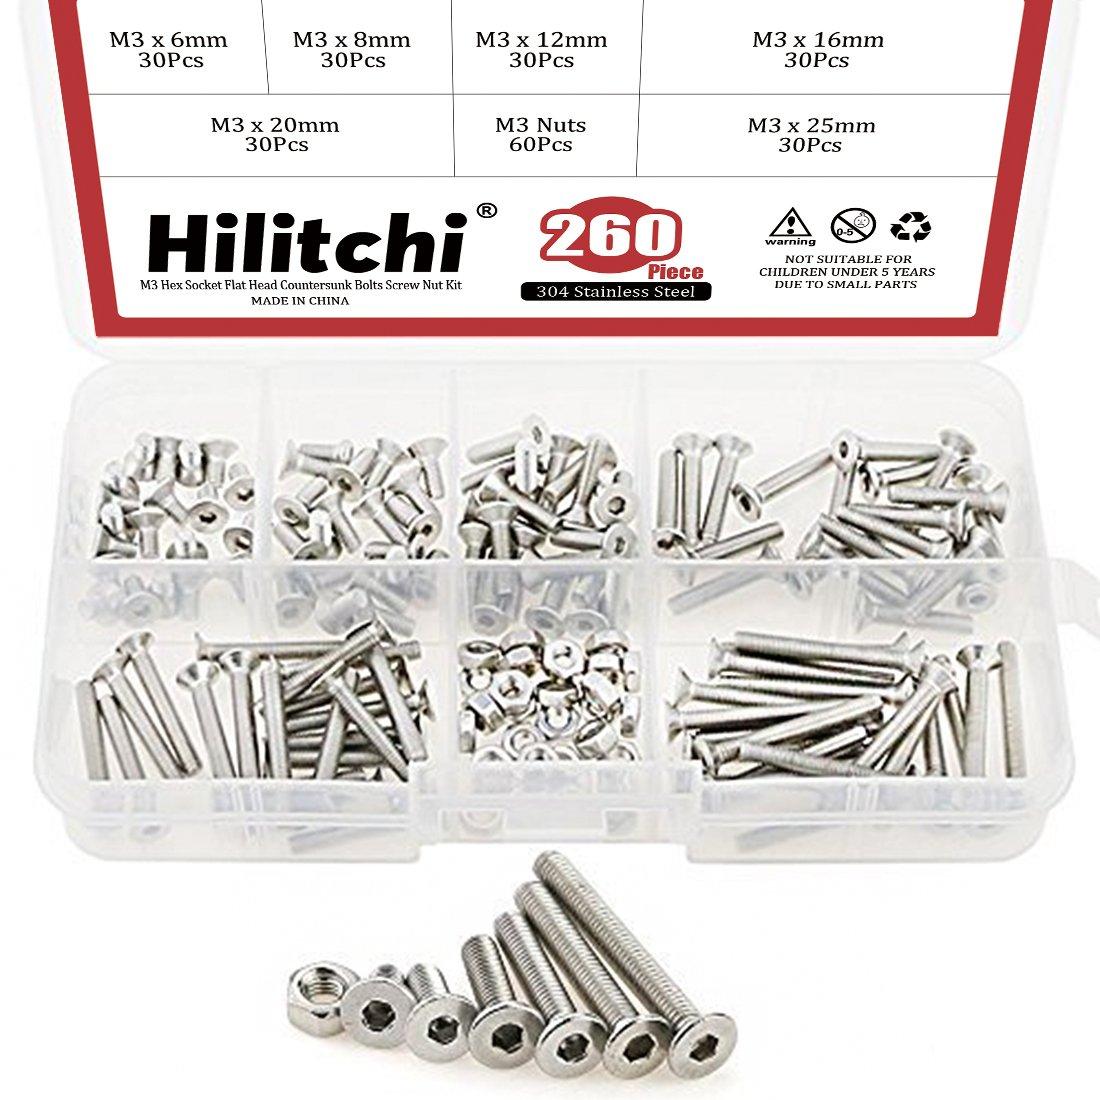 Hilitchi 260-Piece Metric M3 Hex Socket Flat Head Countersunk Bolts Screw Nut Assortment Kit - 304 Stainless Steel